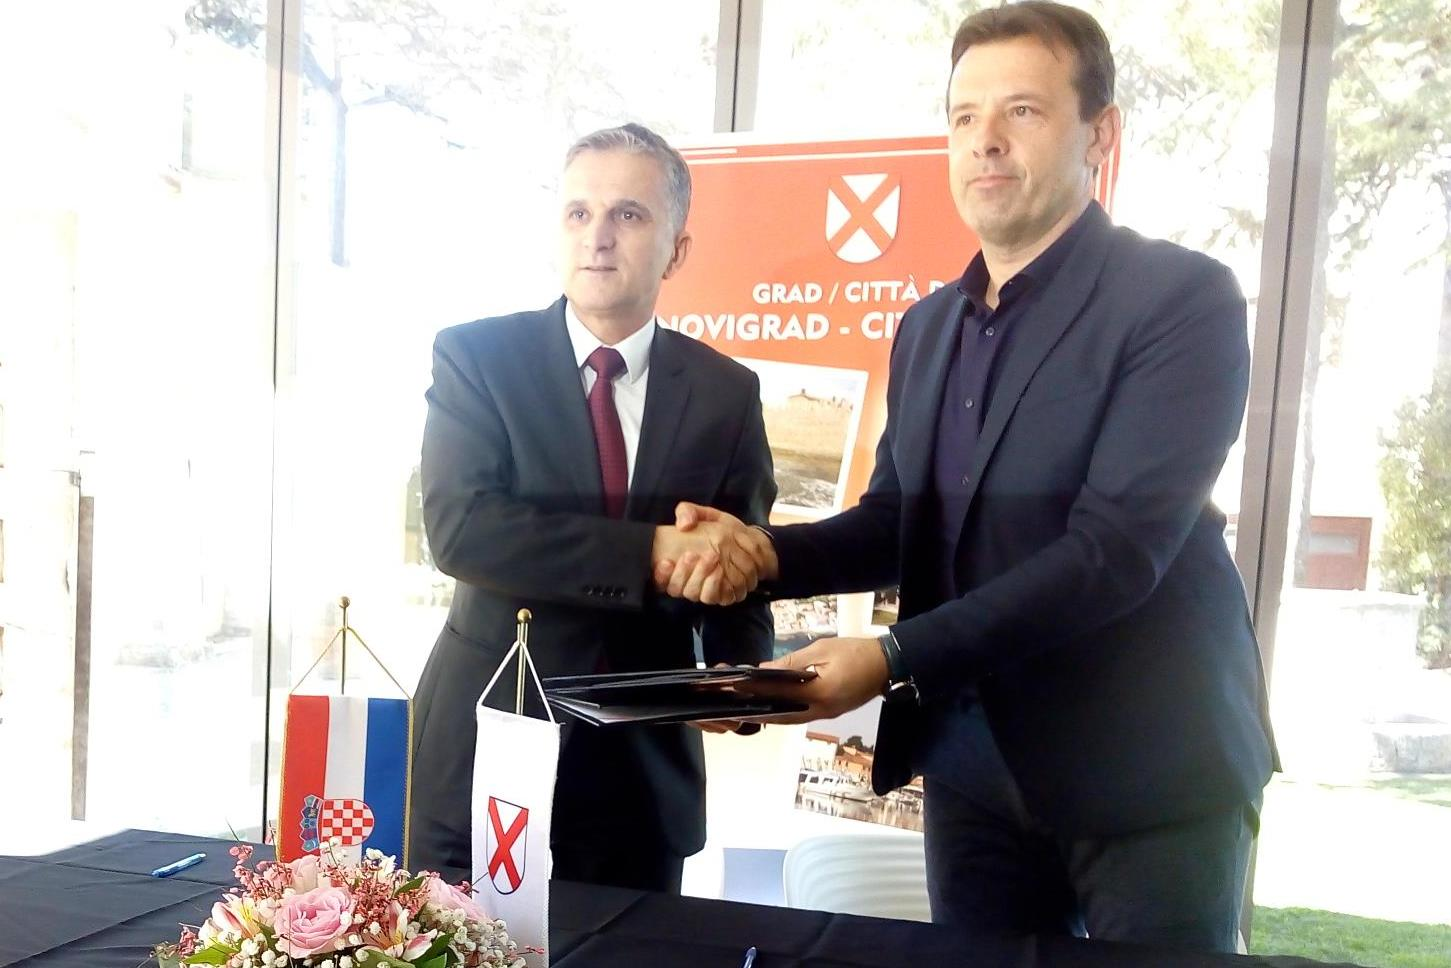 Ministar Marić i gradonačelnik Milos potpisali Ugovor o darovanju zemljišta za proširenje radne zone Vidal